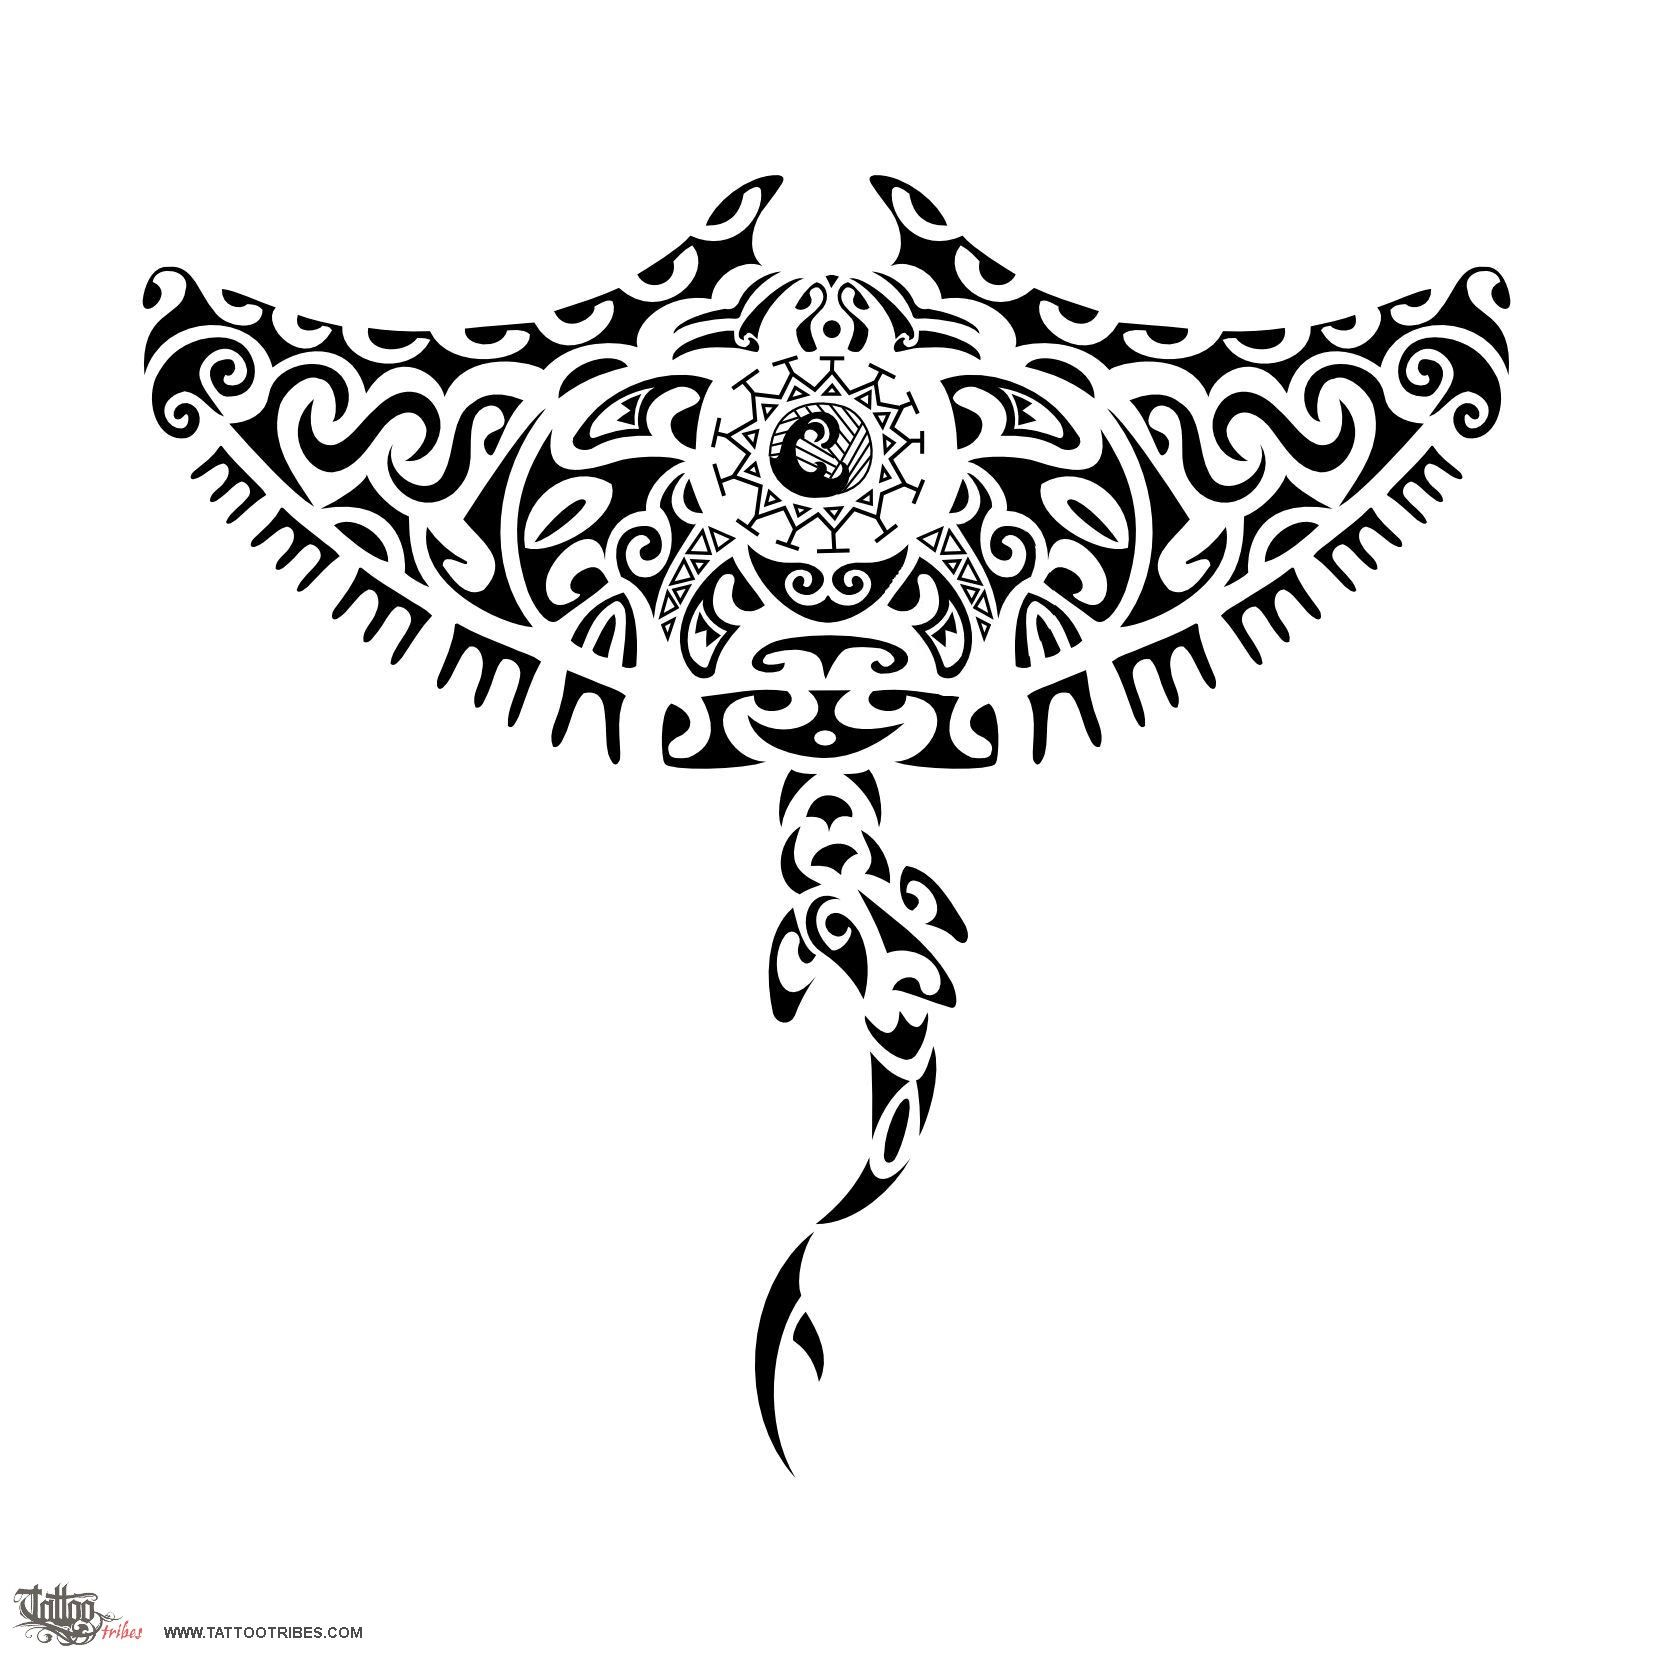 tatuaggio di rawahi oltreoceano tattoo custom tattoo. Black Bedroom Furniture Sets. Home Design Ideas